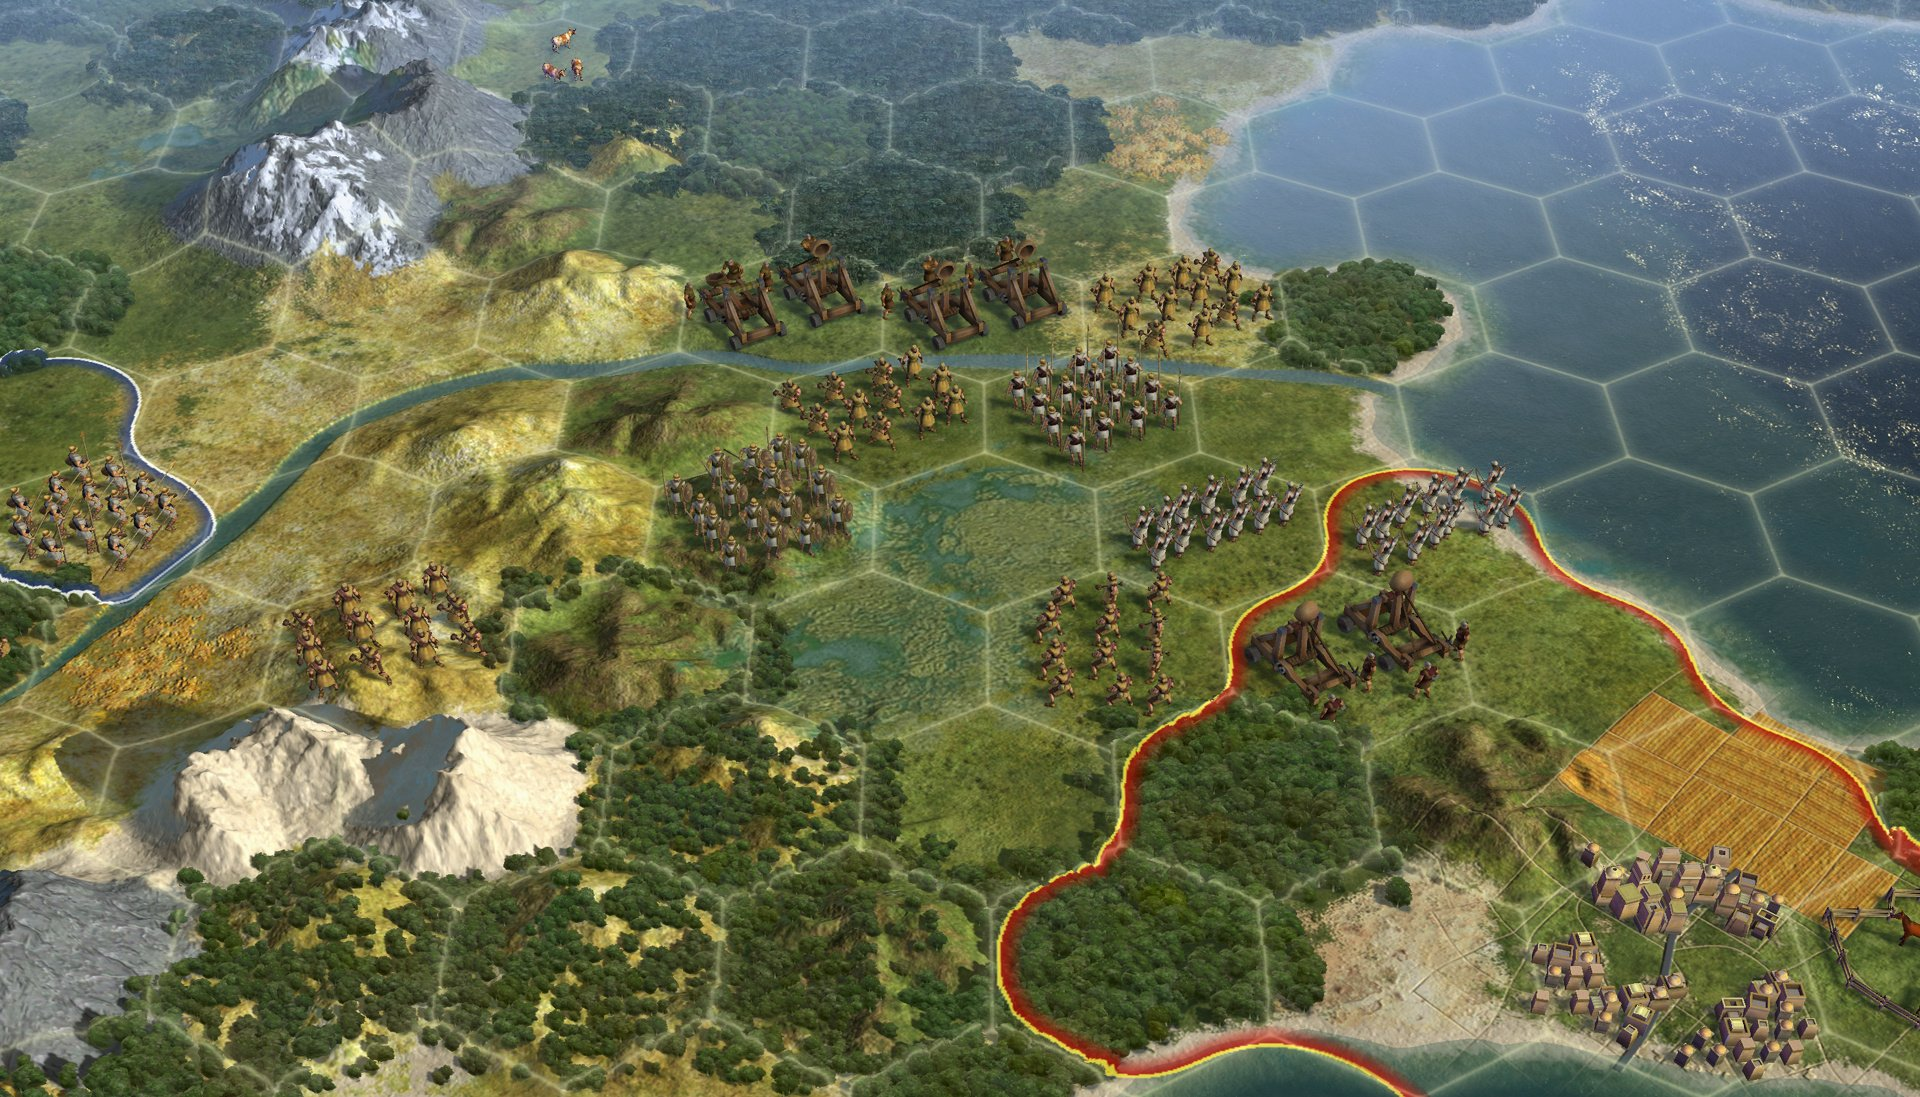 Civilization V Announced, First Screenshots Released #11852